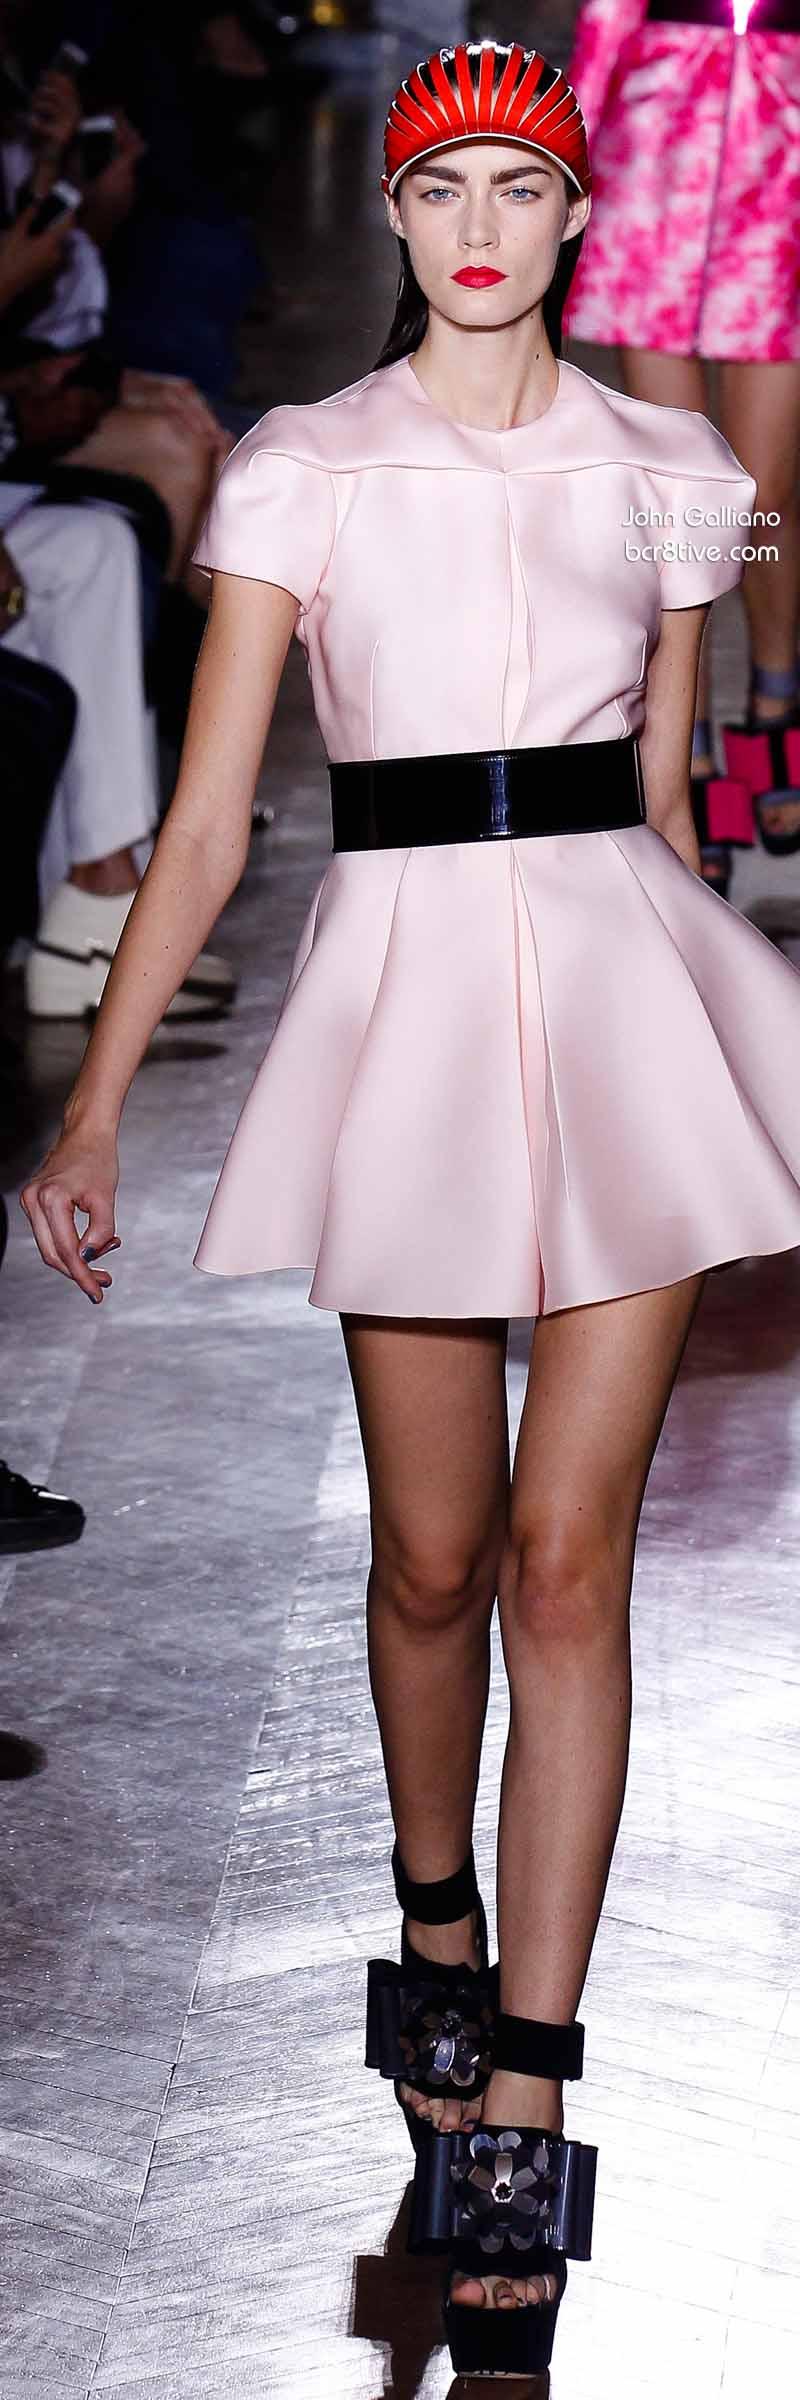 John Galliano - Baby Pink Skater Style Dress